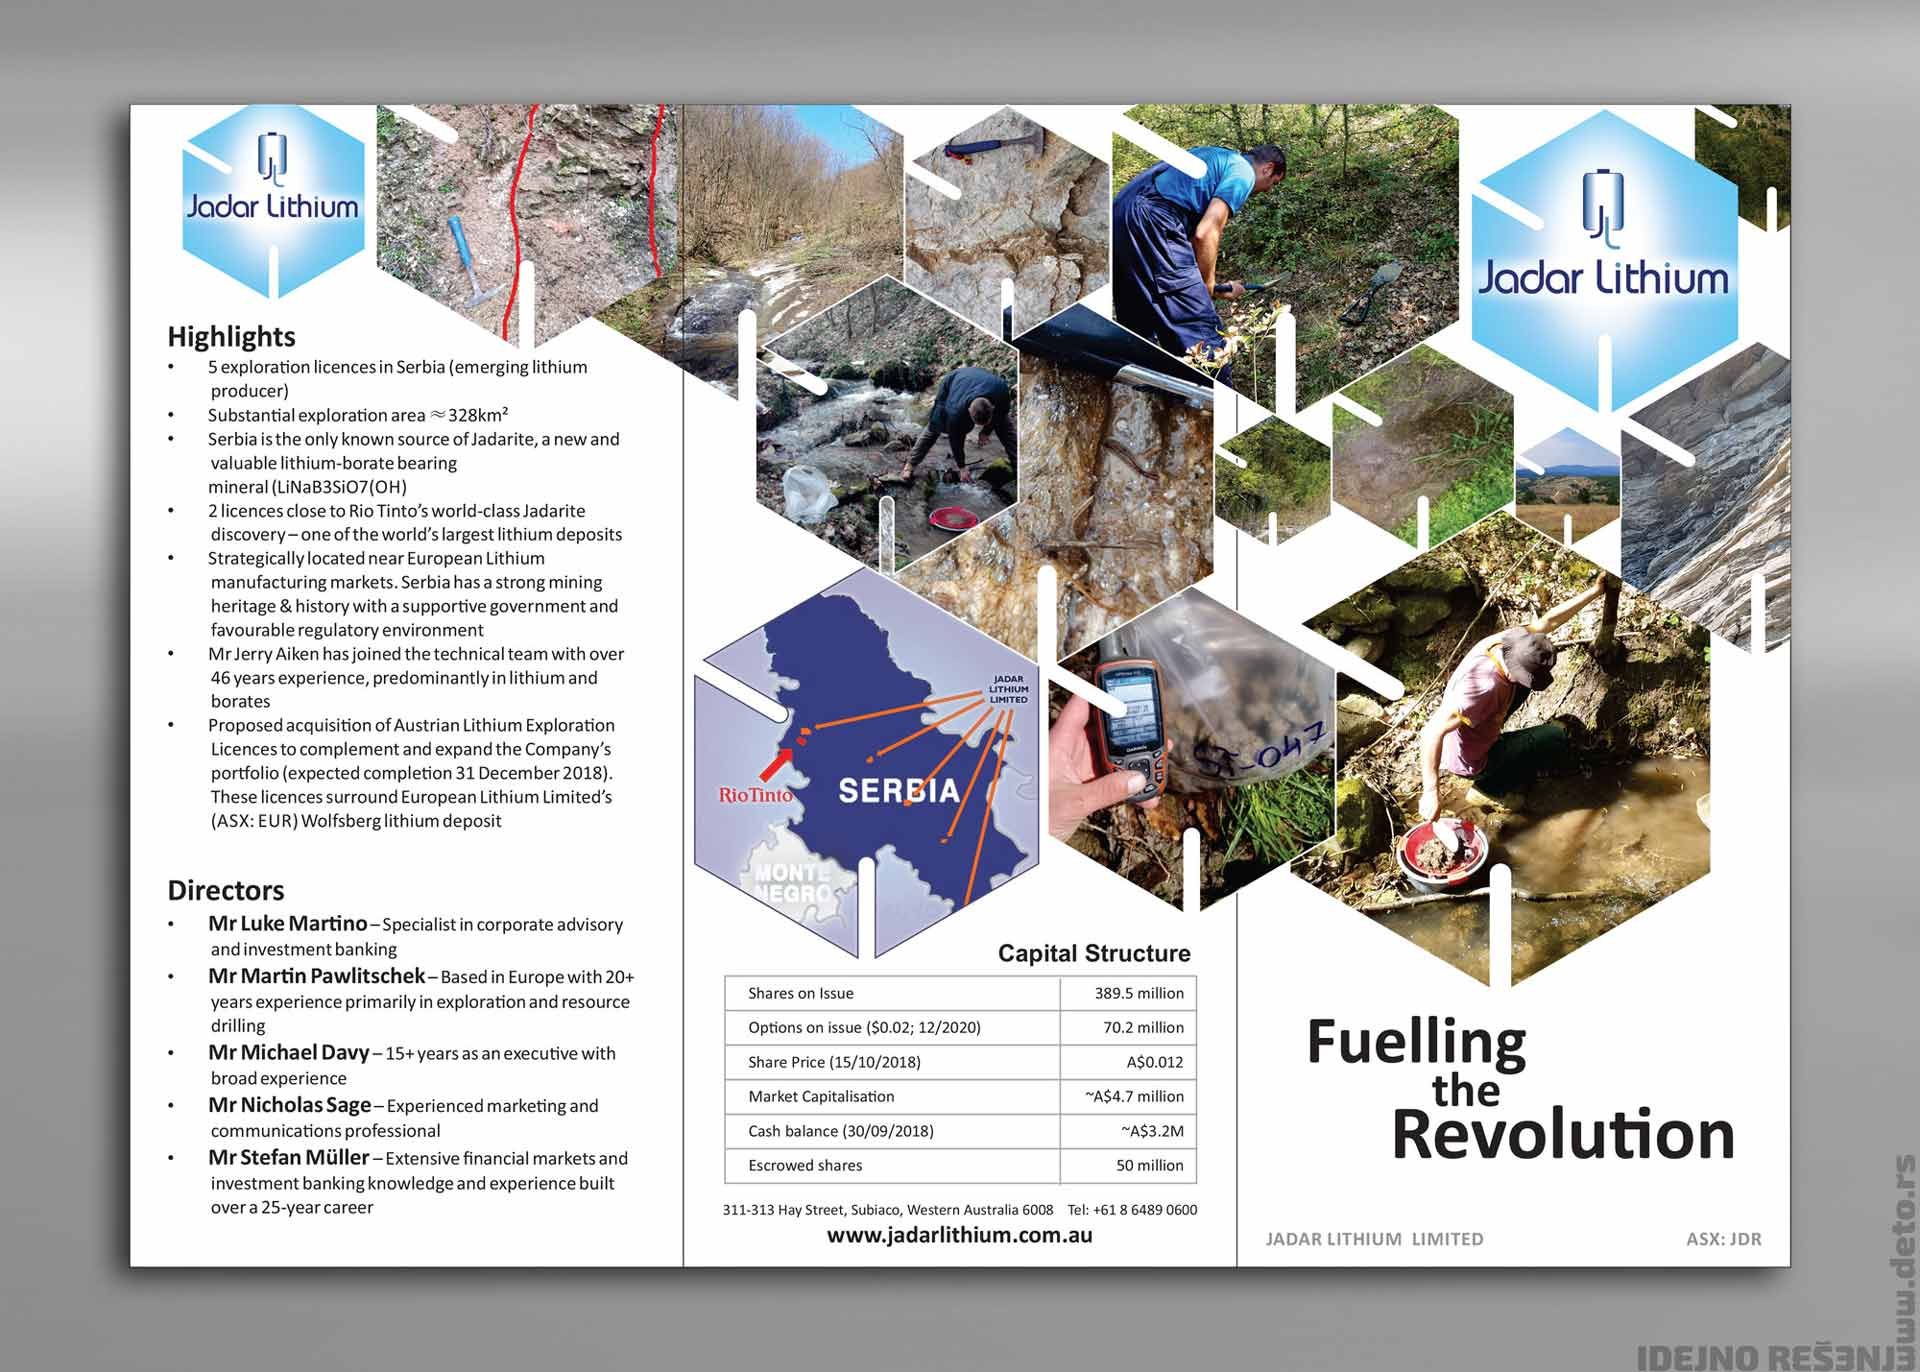 Dizajn - Idejno rešenje flajera A4   / Jadar Lithium (Australija)